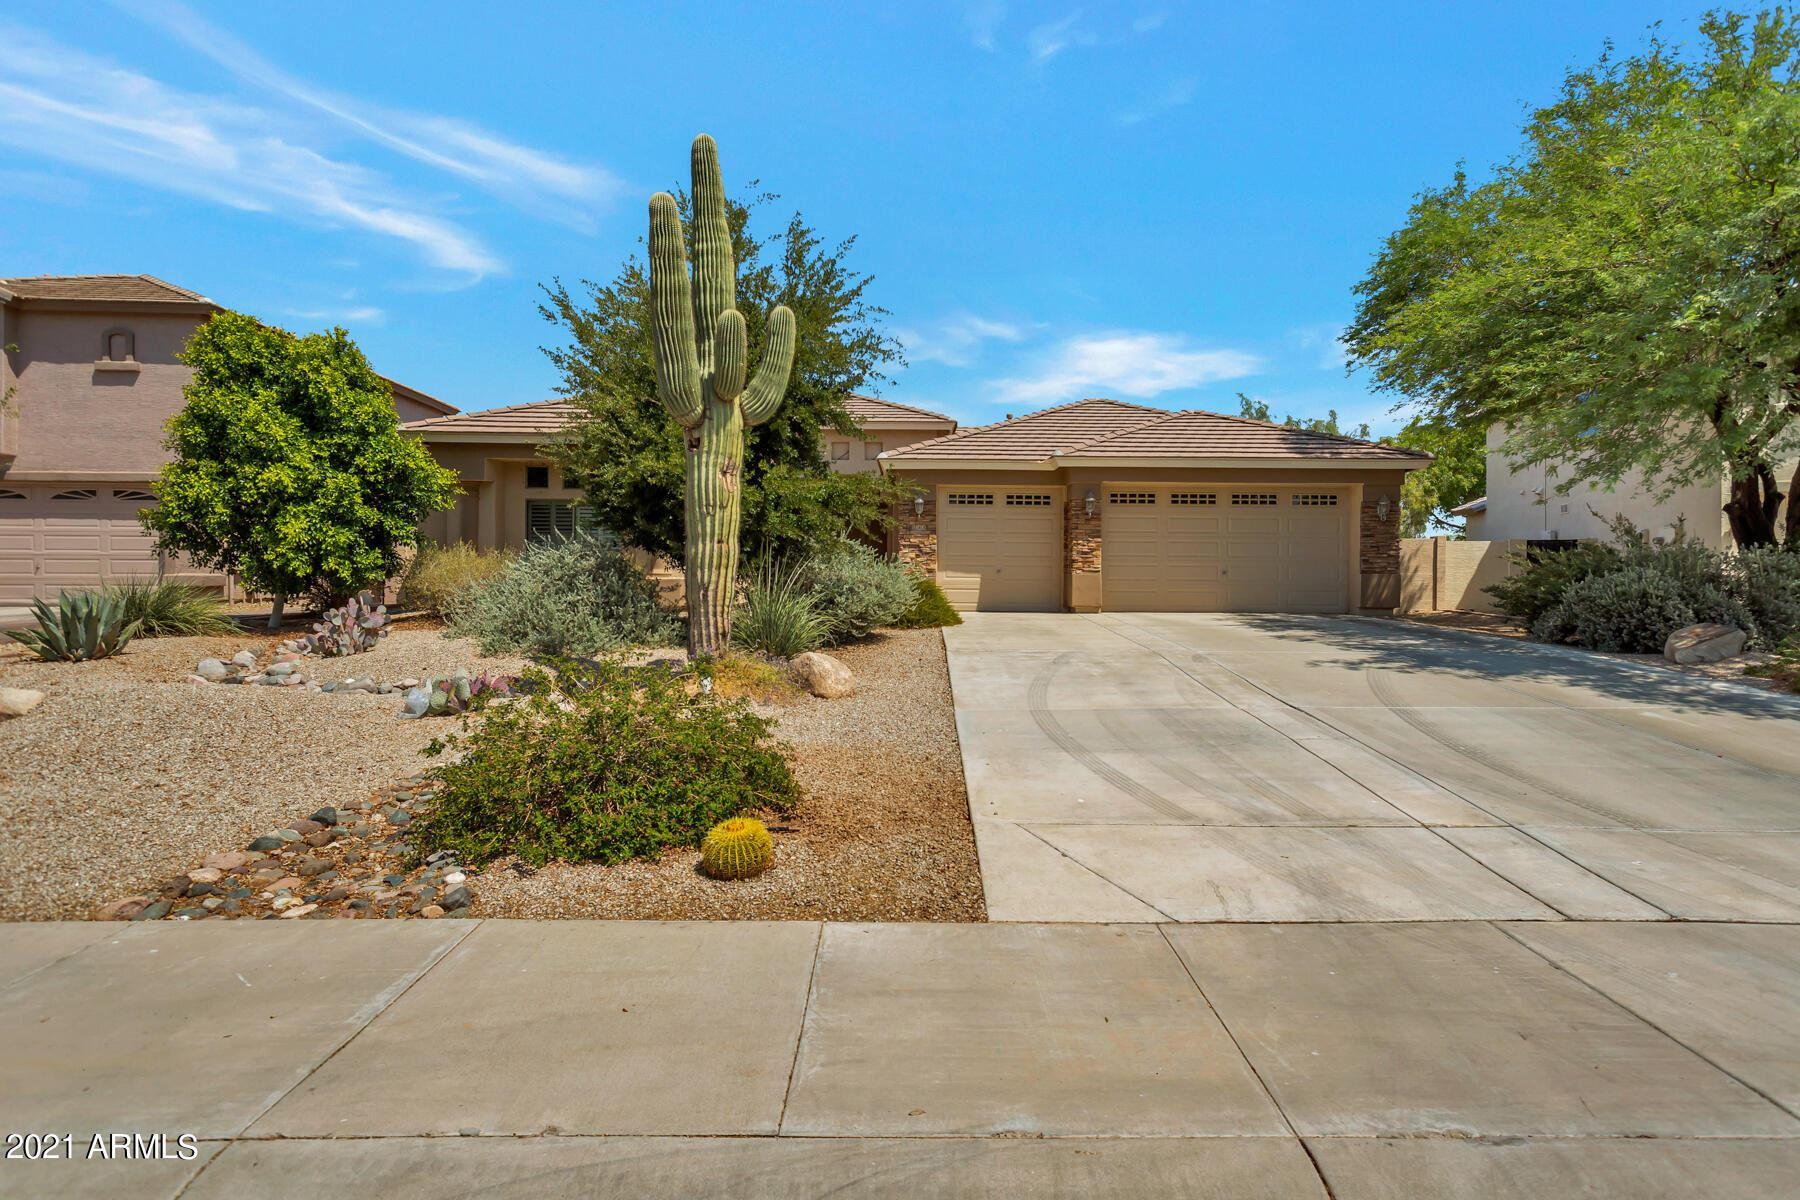 Photo of 14130 W WOODBRIDGE Avenue, Goodyear, AZ 85395 (MLS # 6301033)